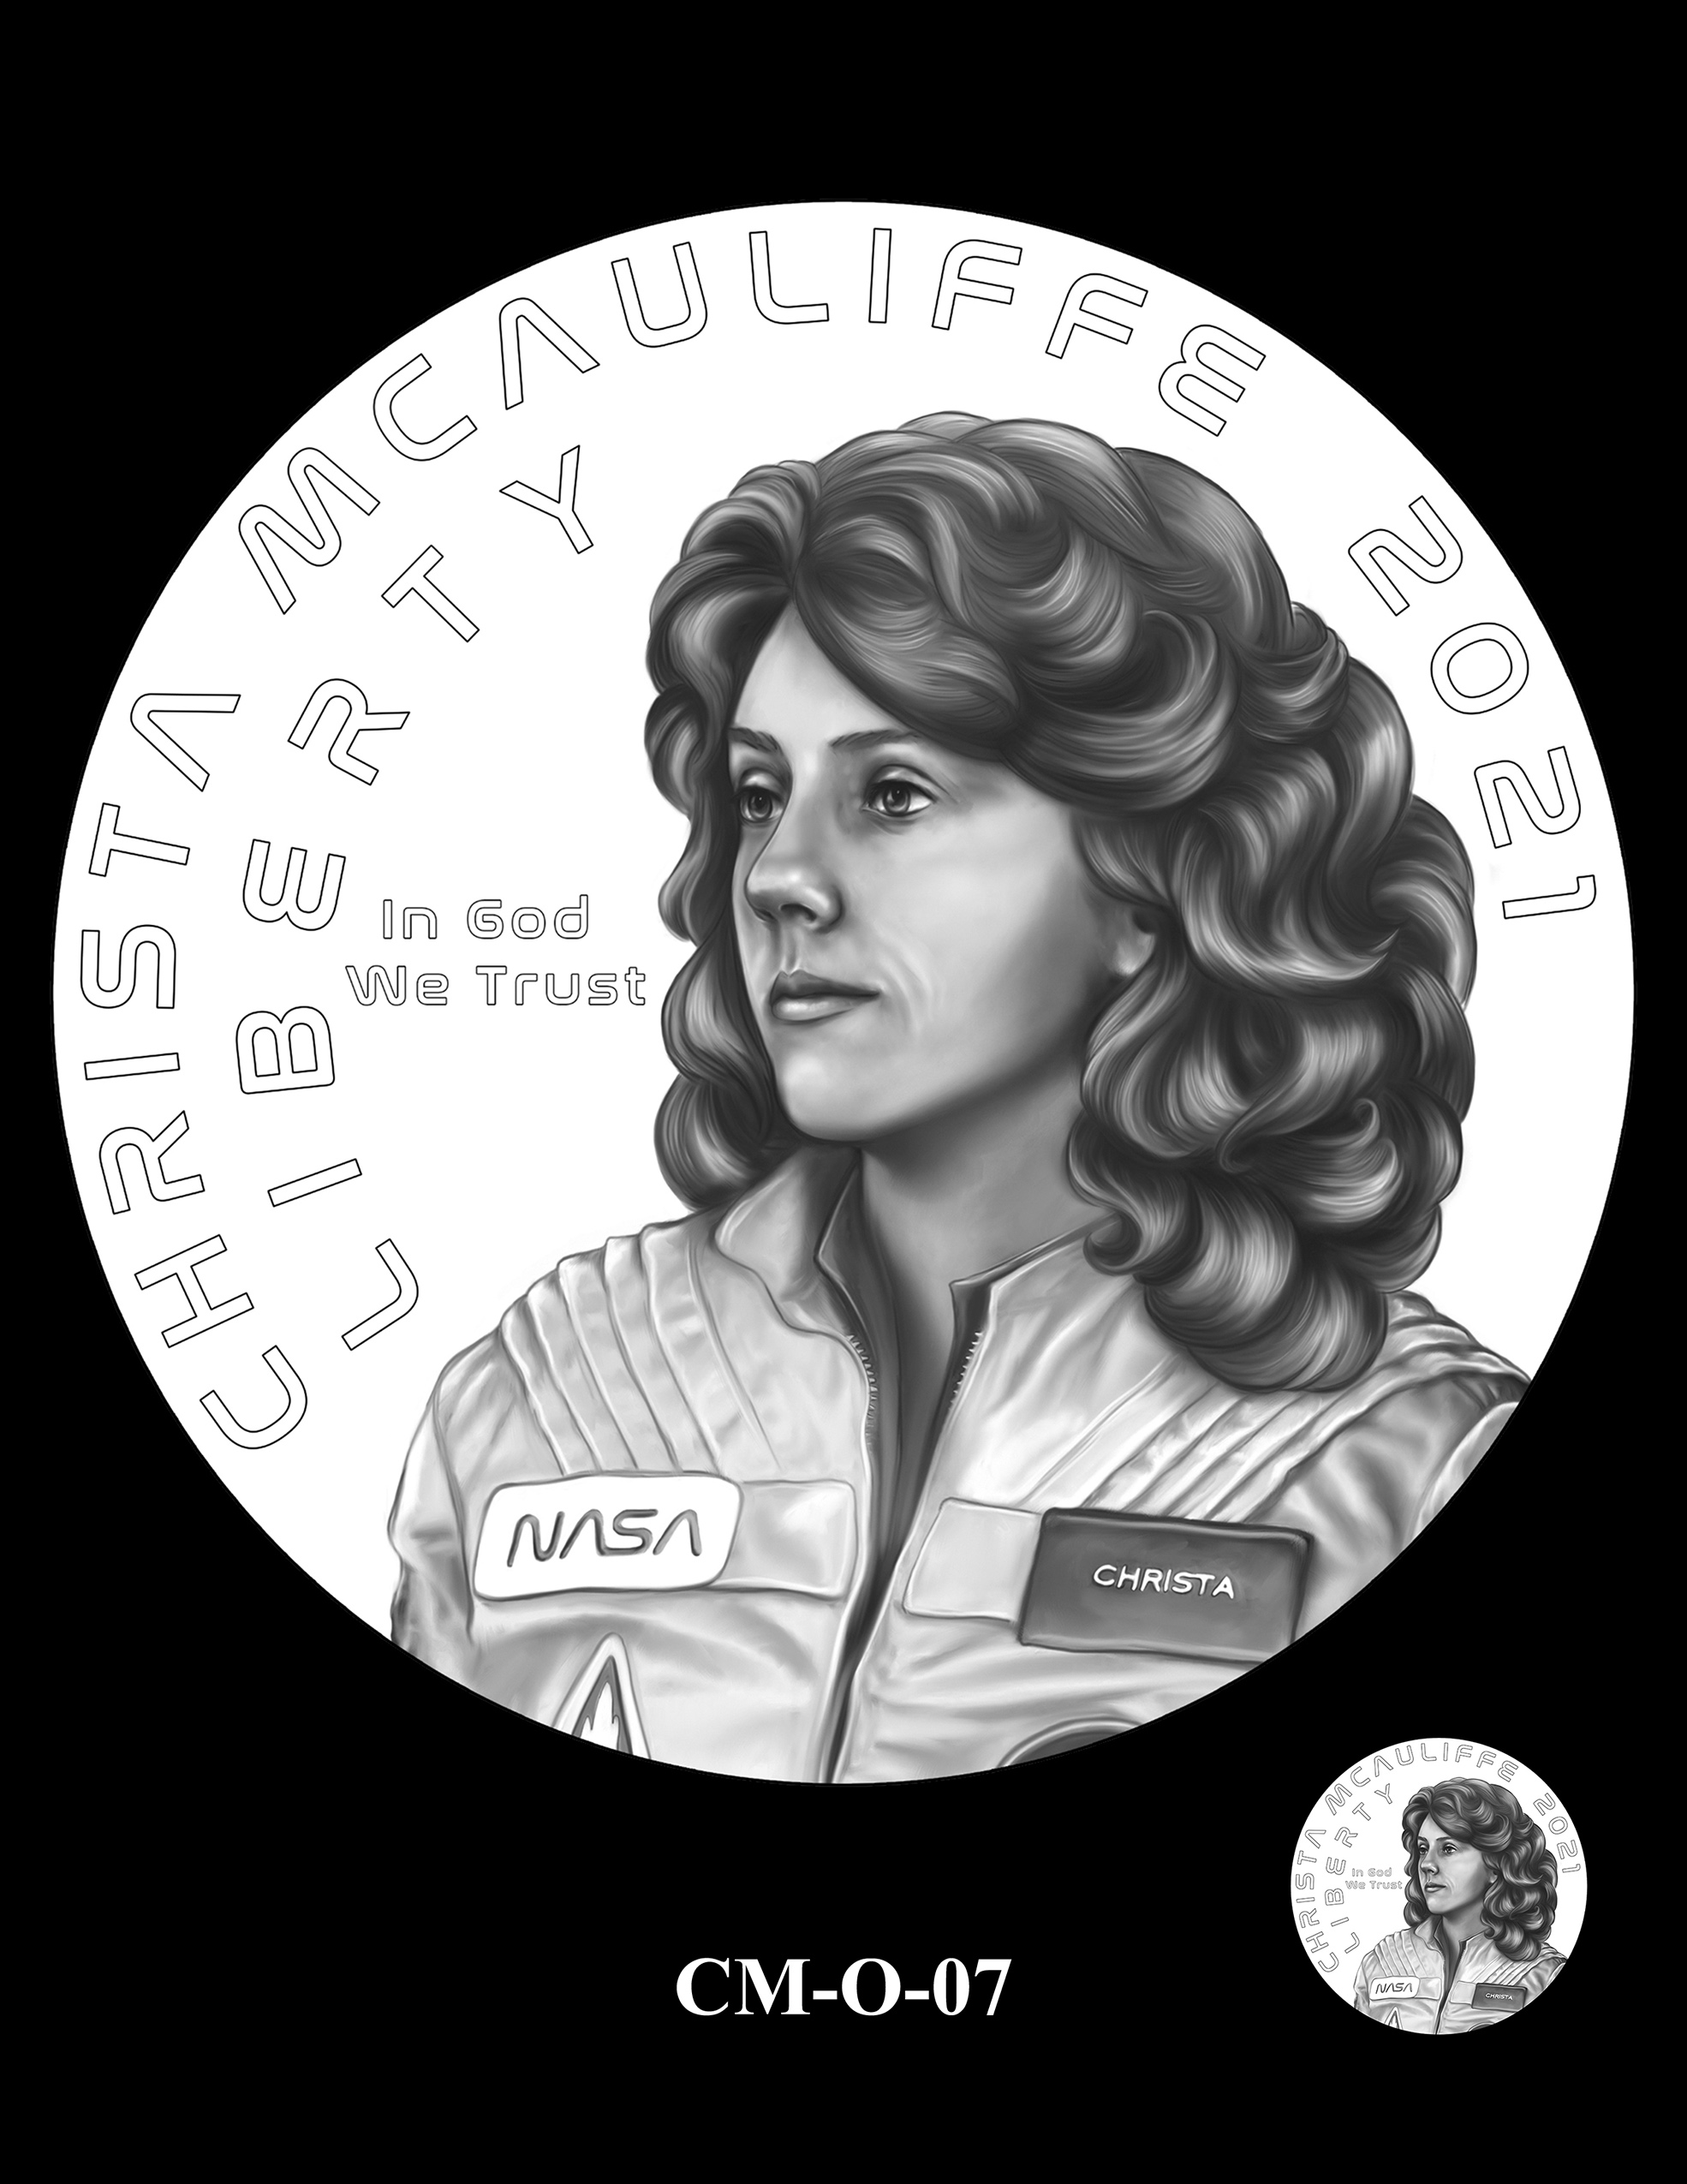 CM-O-07 -- 2021 Christa McAuliffe Commemorative Coin